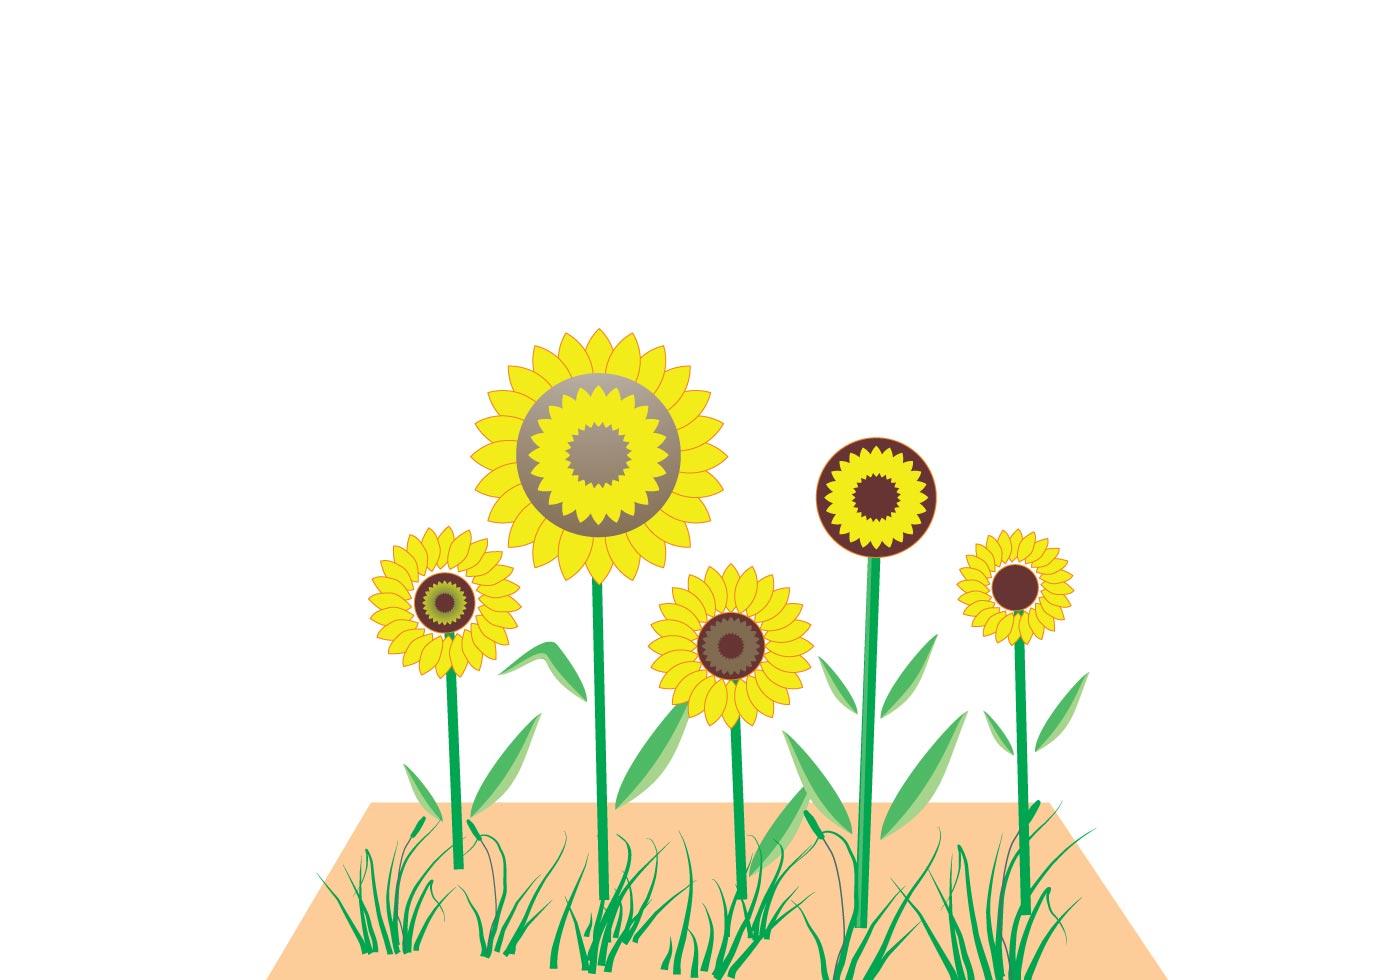 Sunflower Vector | Free Vector Art at Vecteezy!